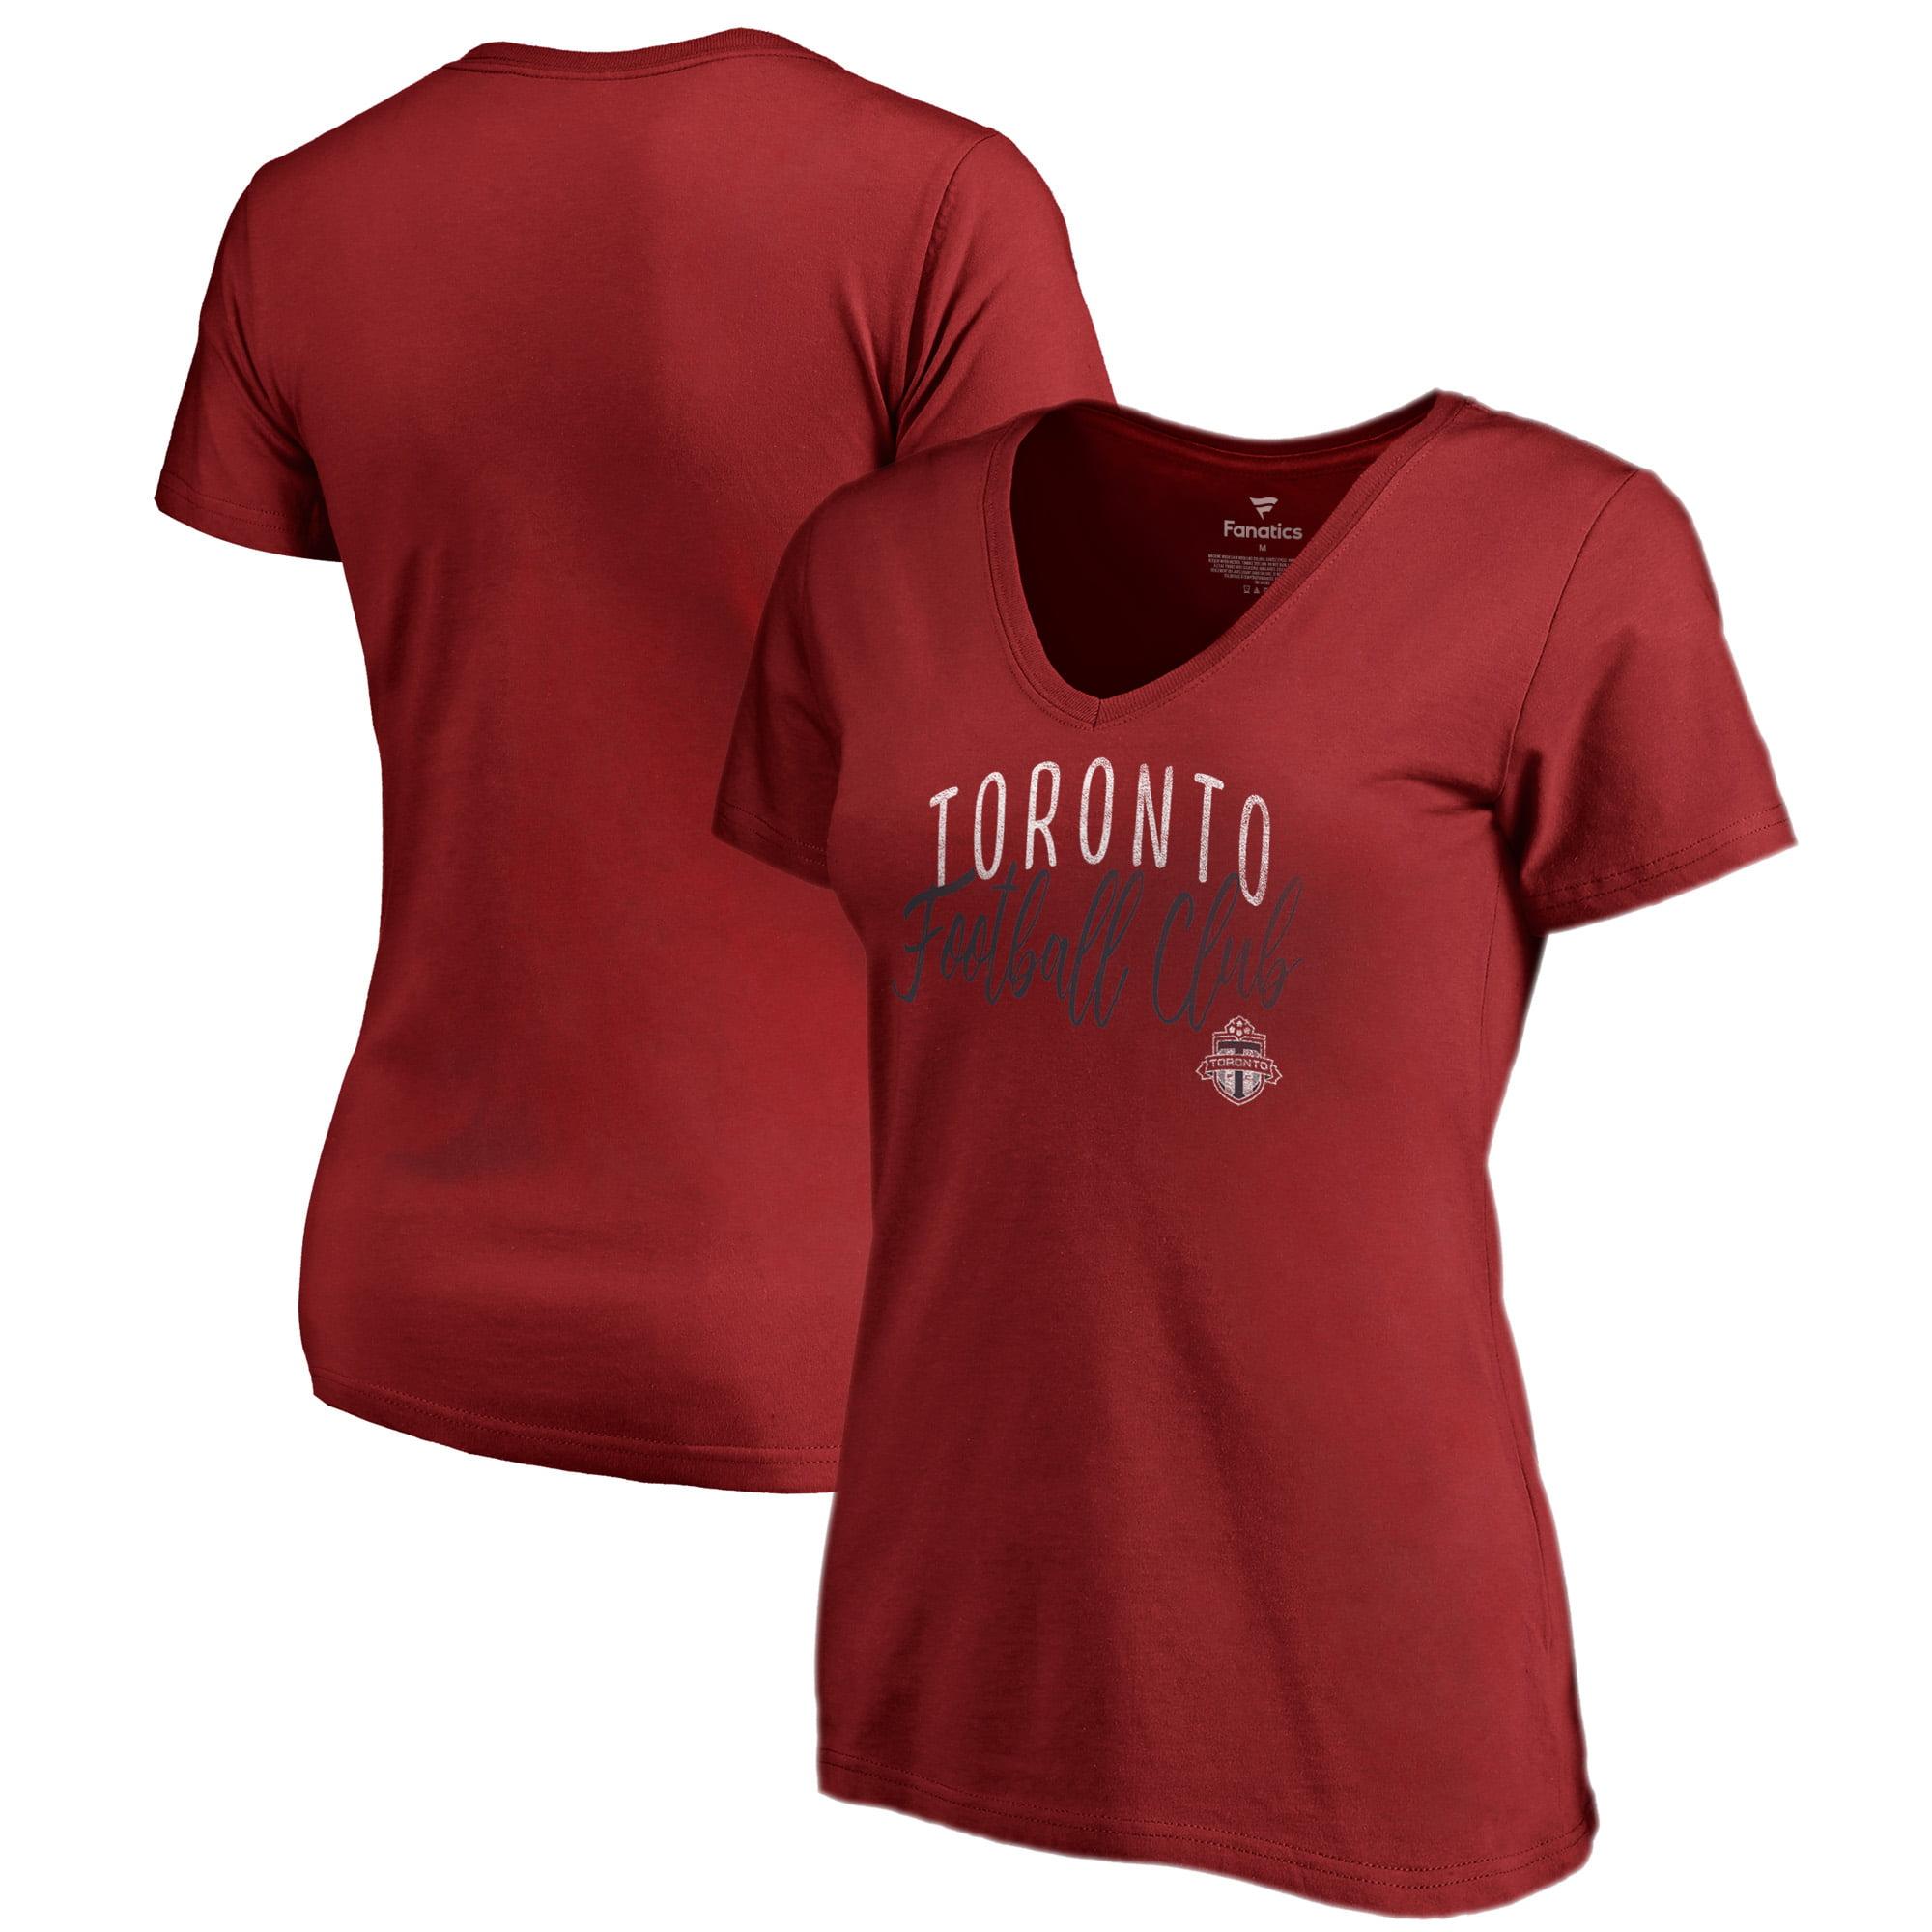 Toronto FC Fanatics Branded Women's Graceful V-Neck T-Shirt - Red